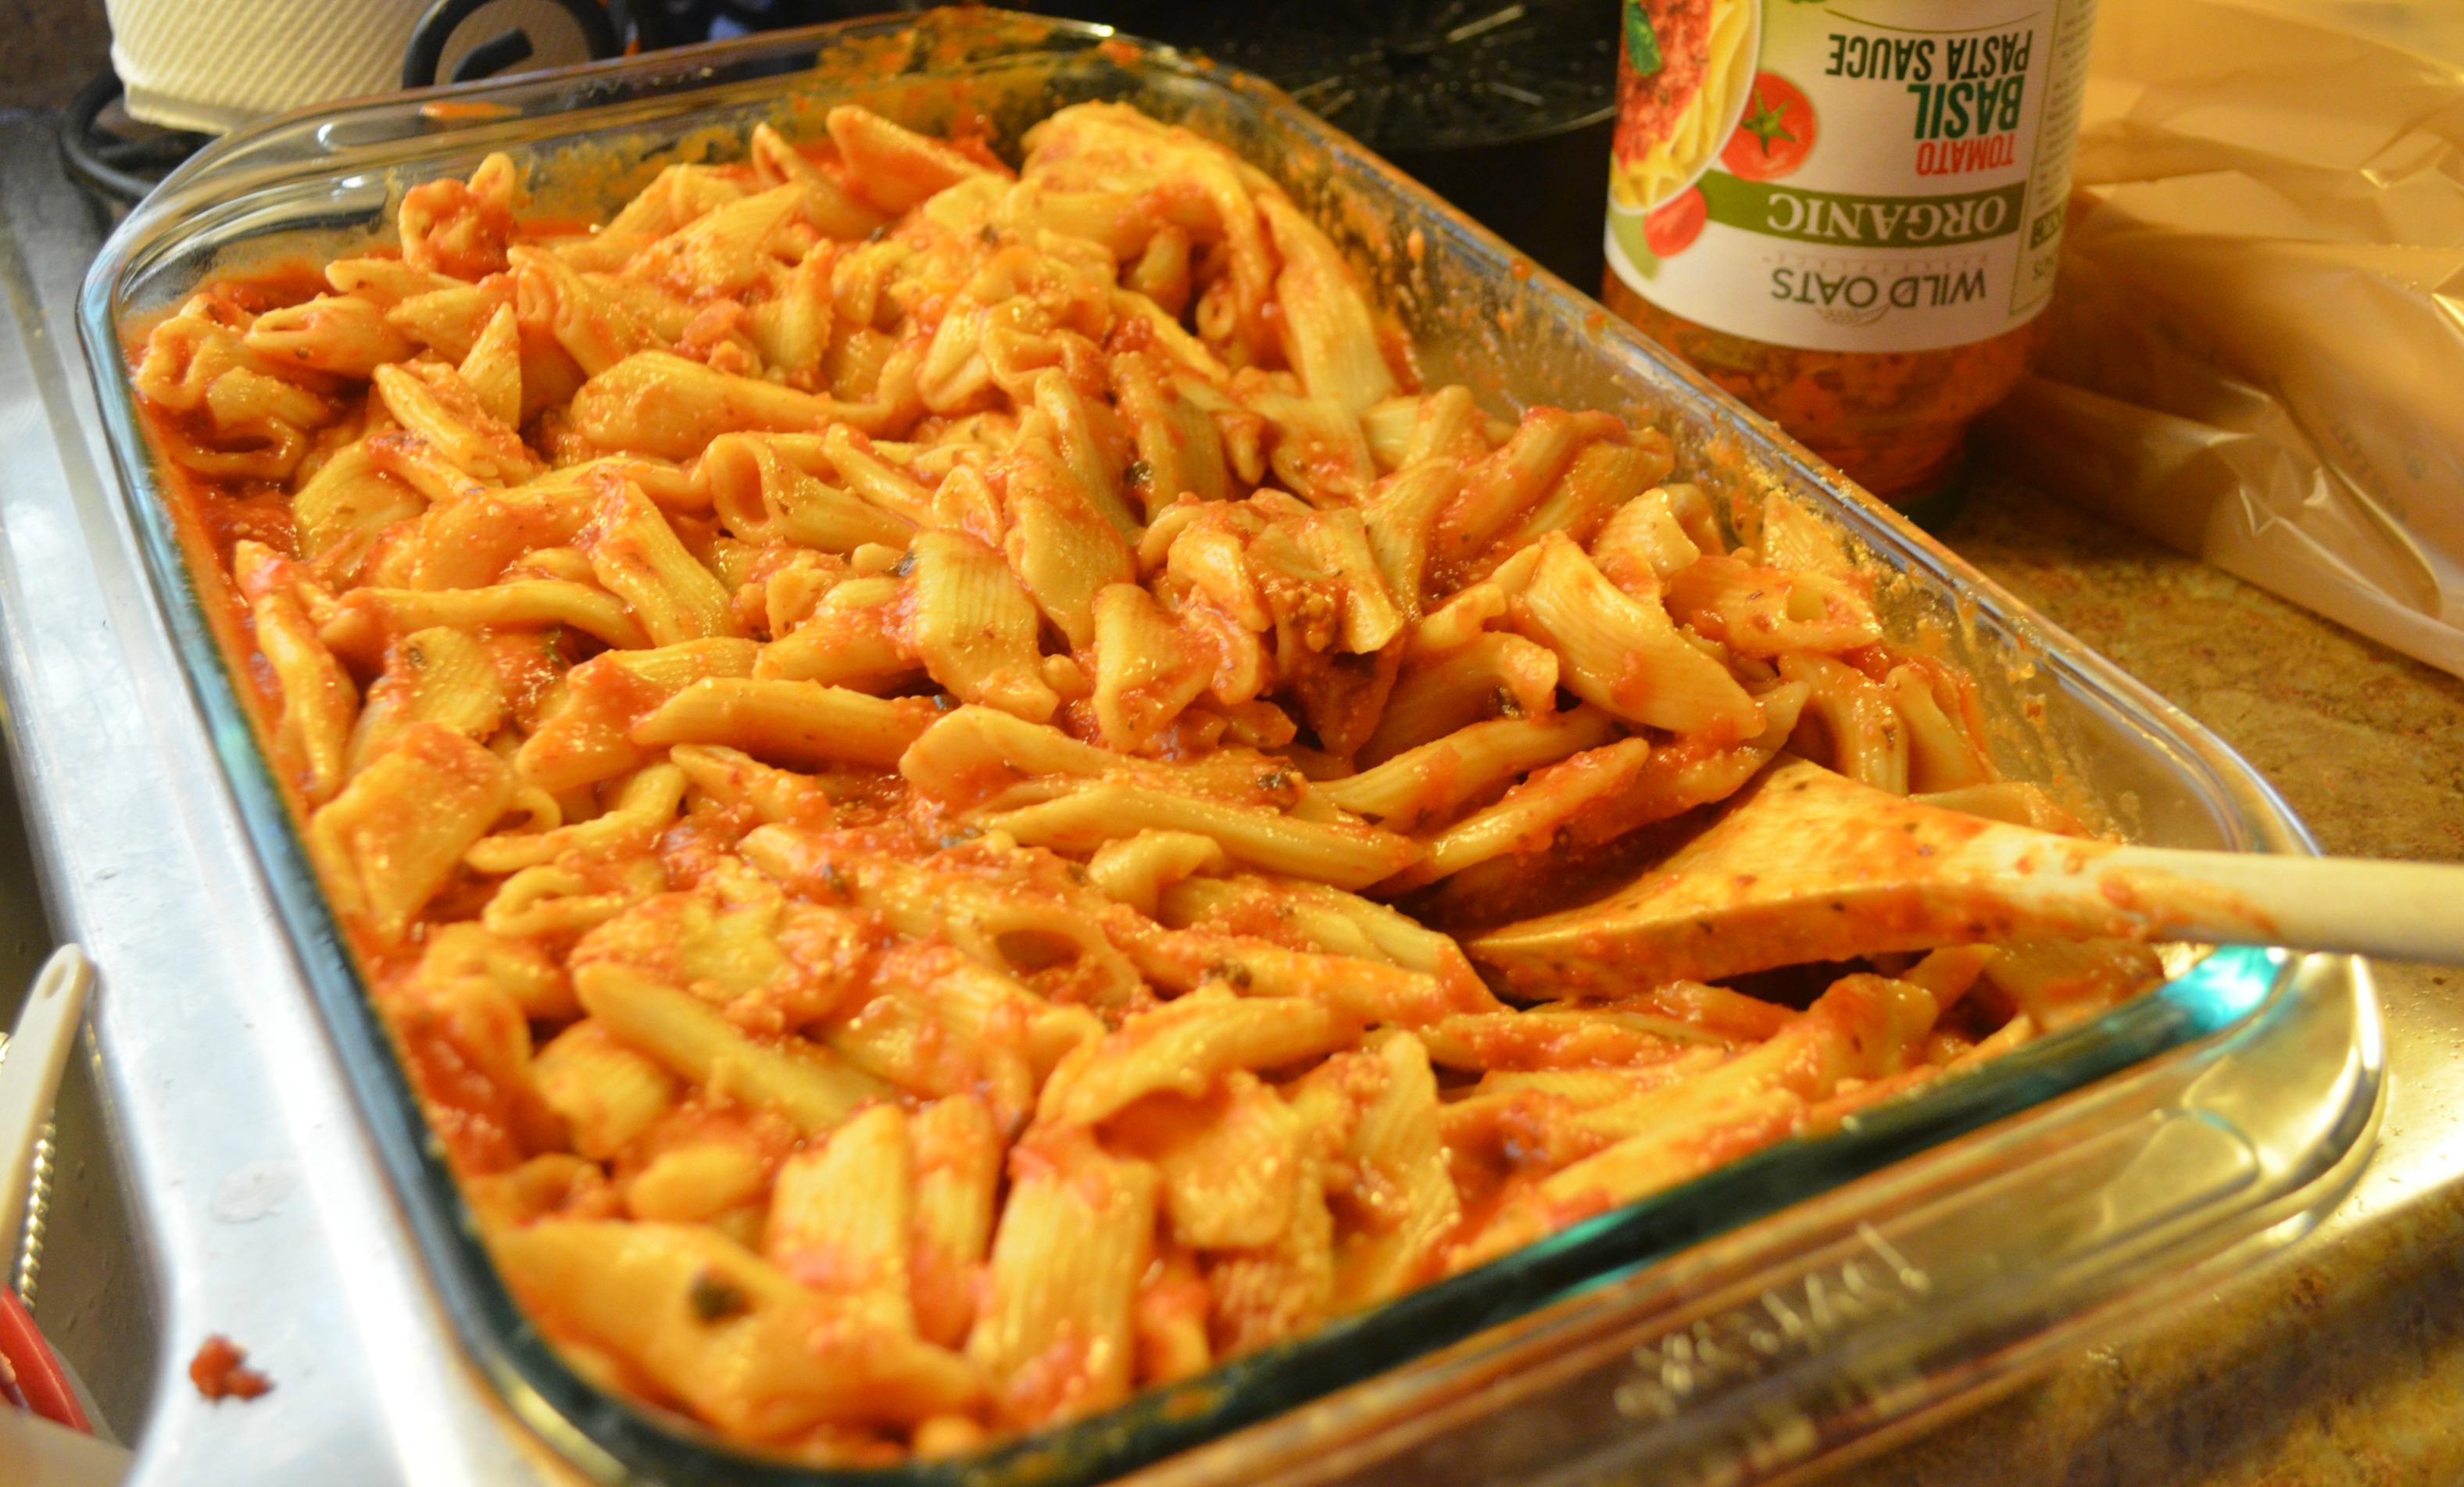 Noodles Mixture Ziti Chicken